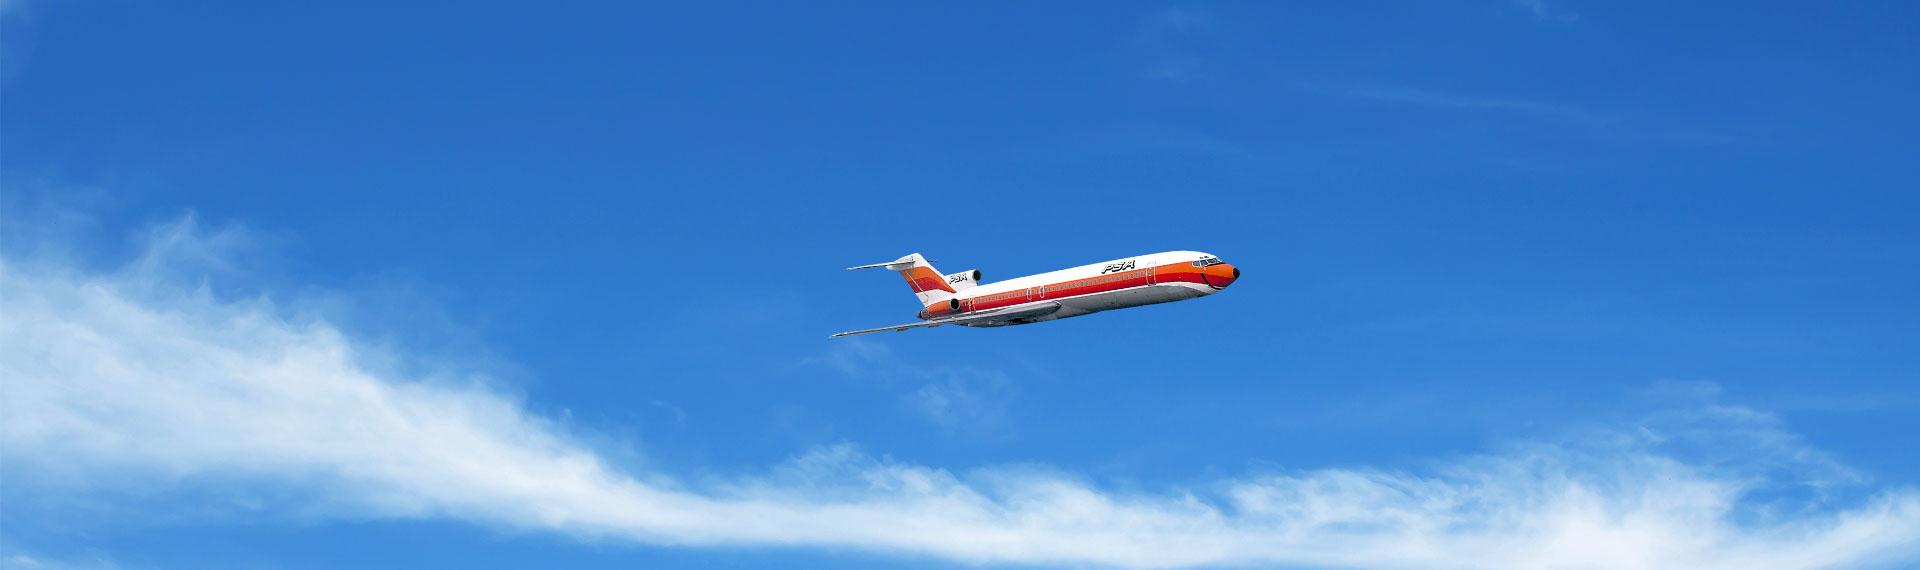 Psa Airlines Airfare Deals Book Flights Tickets On Psa